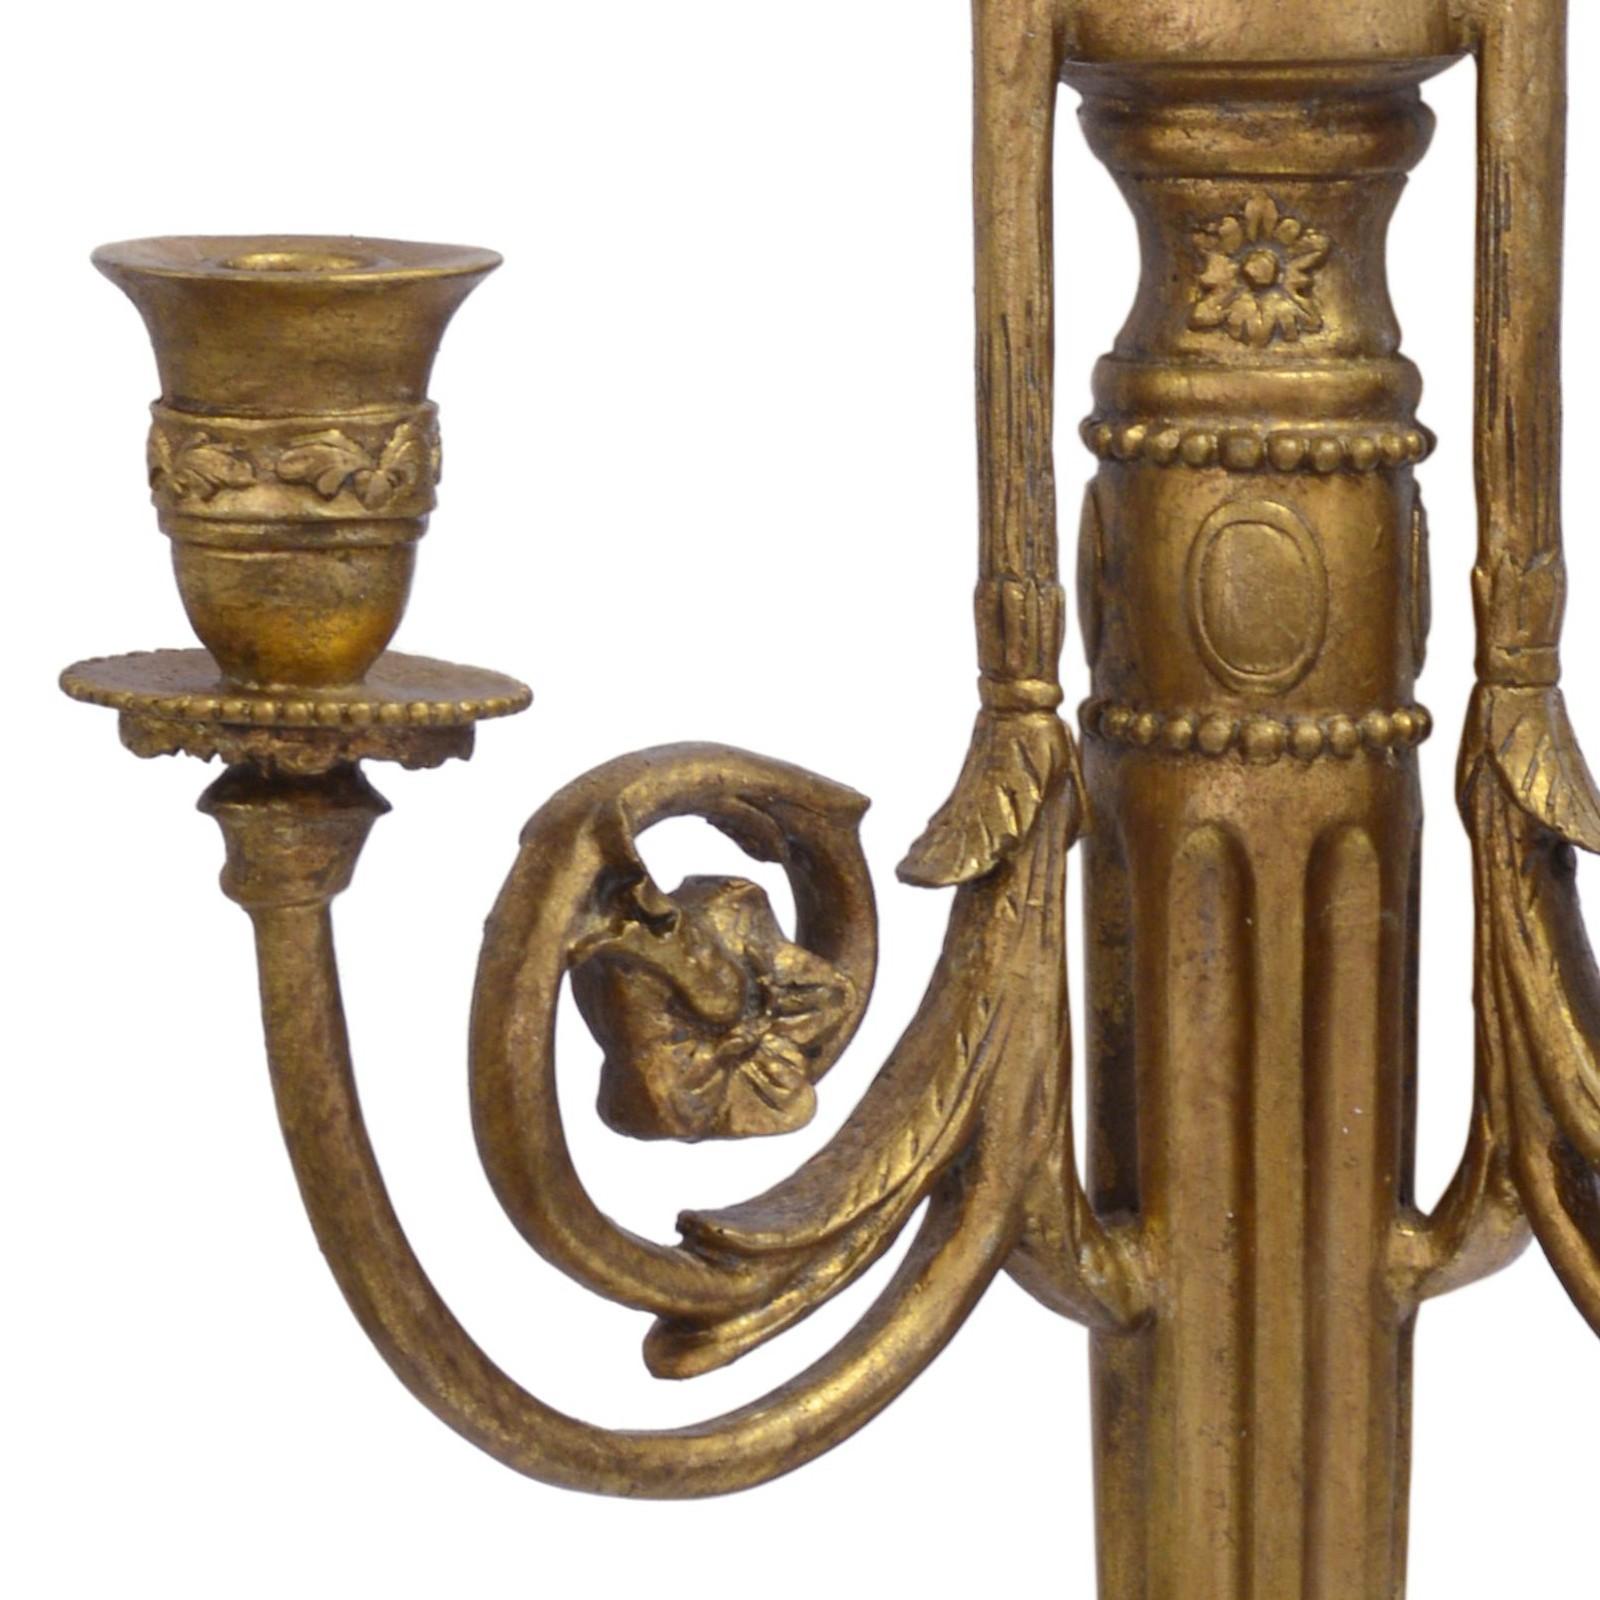 wandkerzenhalter vintage antik retro stil 2er set farbe gold kerzen halterung. Black Bedroom Furniture Sets. Home Design Ideas